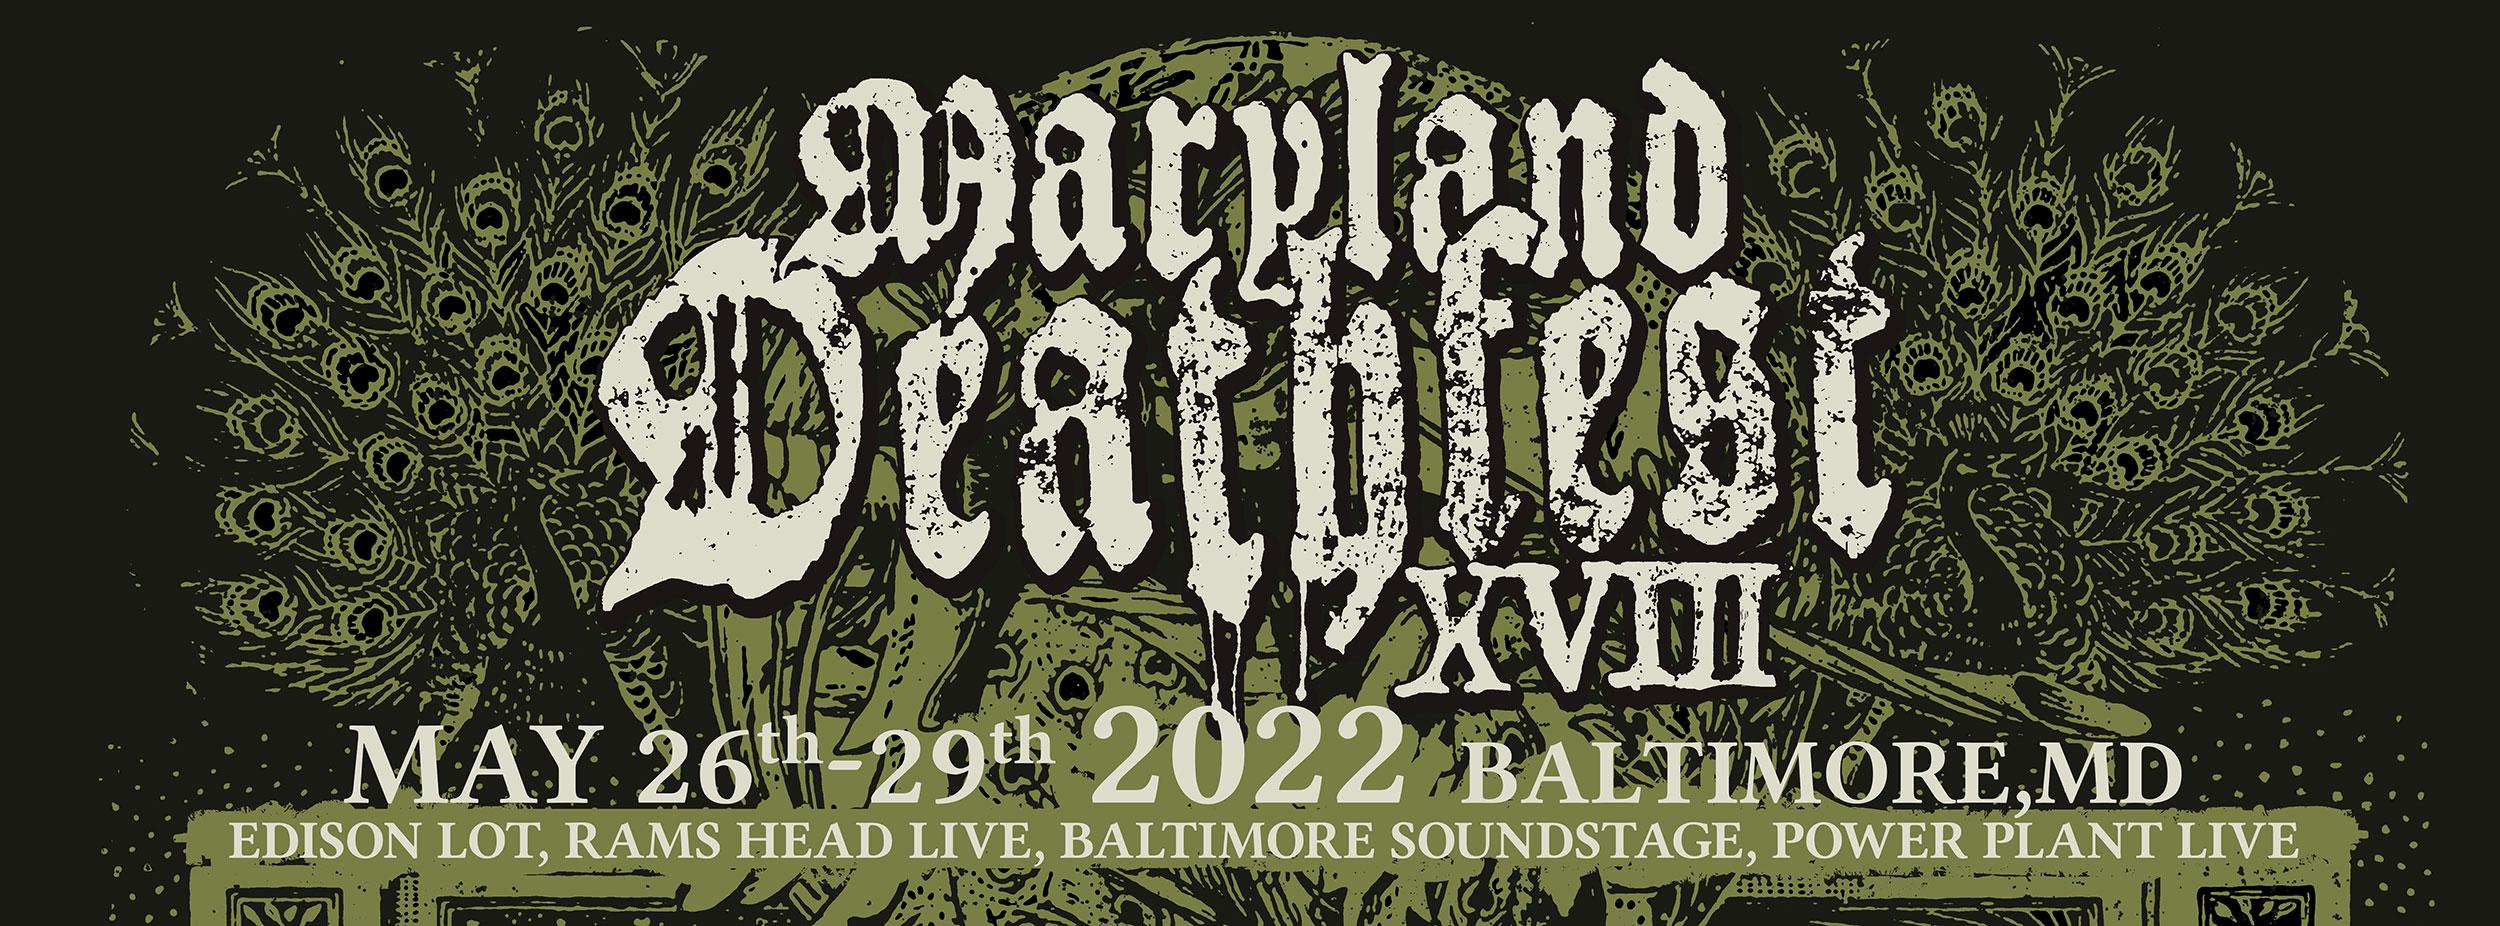 Maryland Deathfest Metal Festival 2022